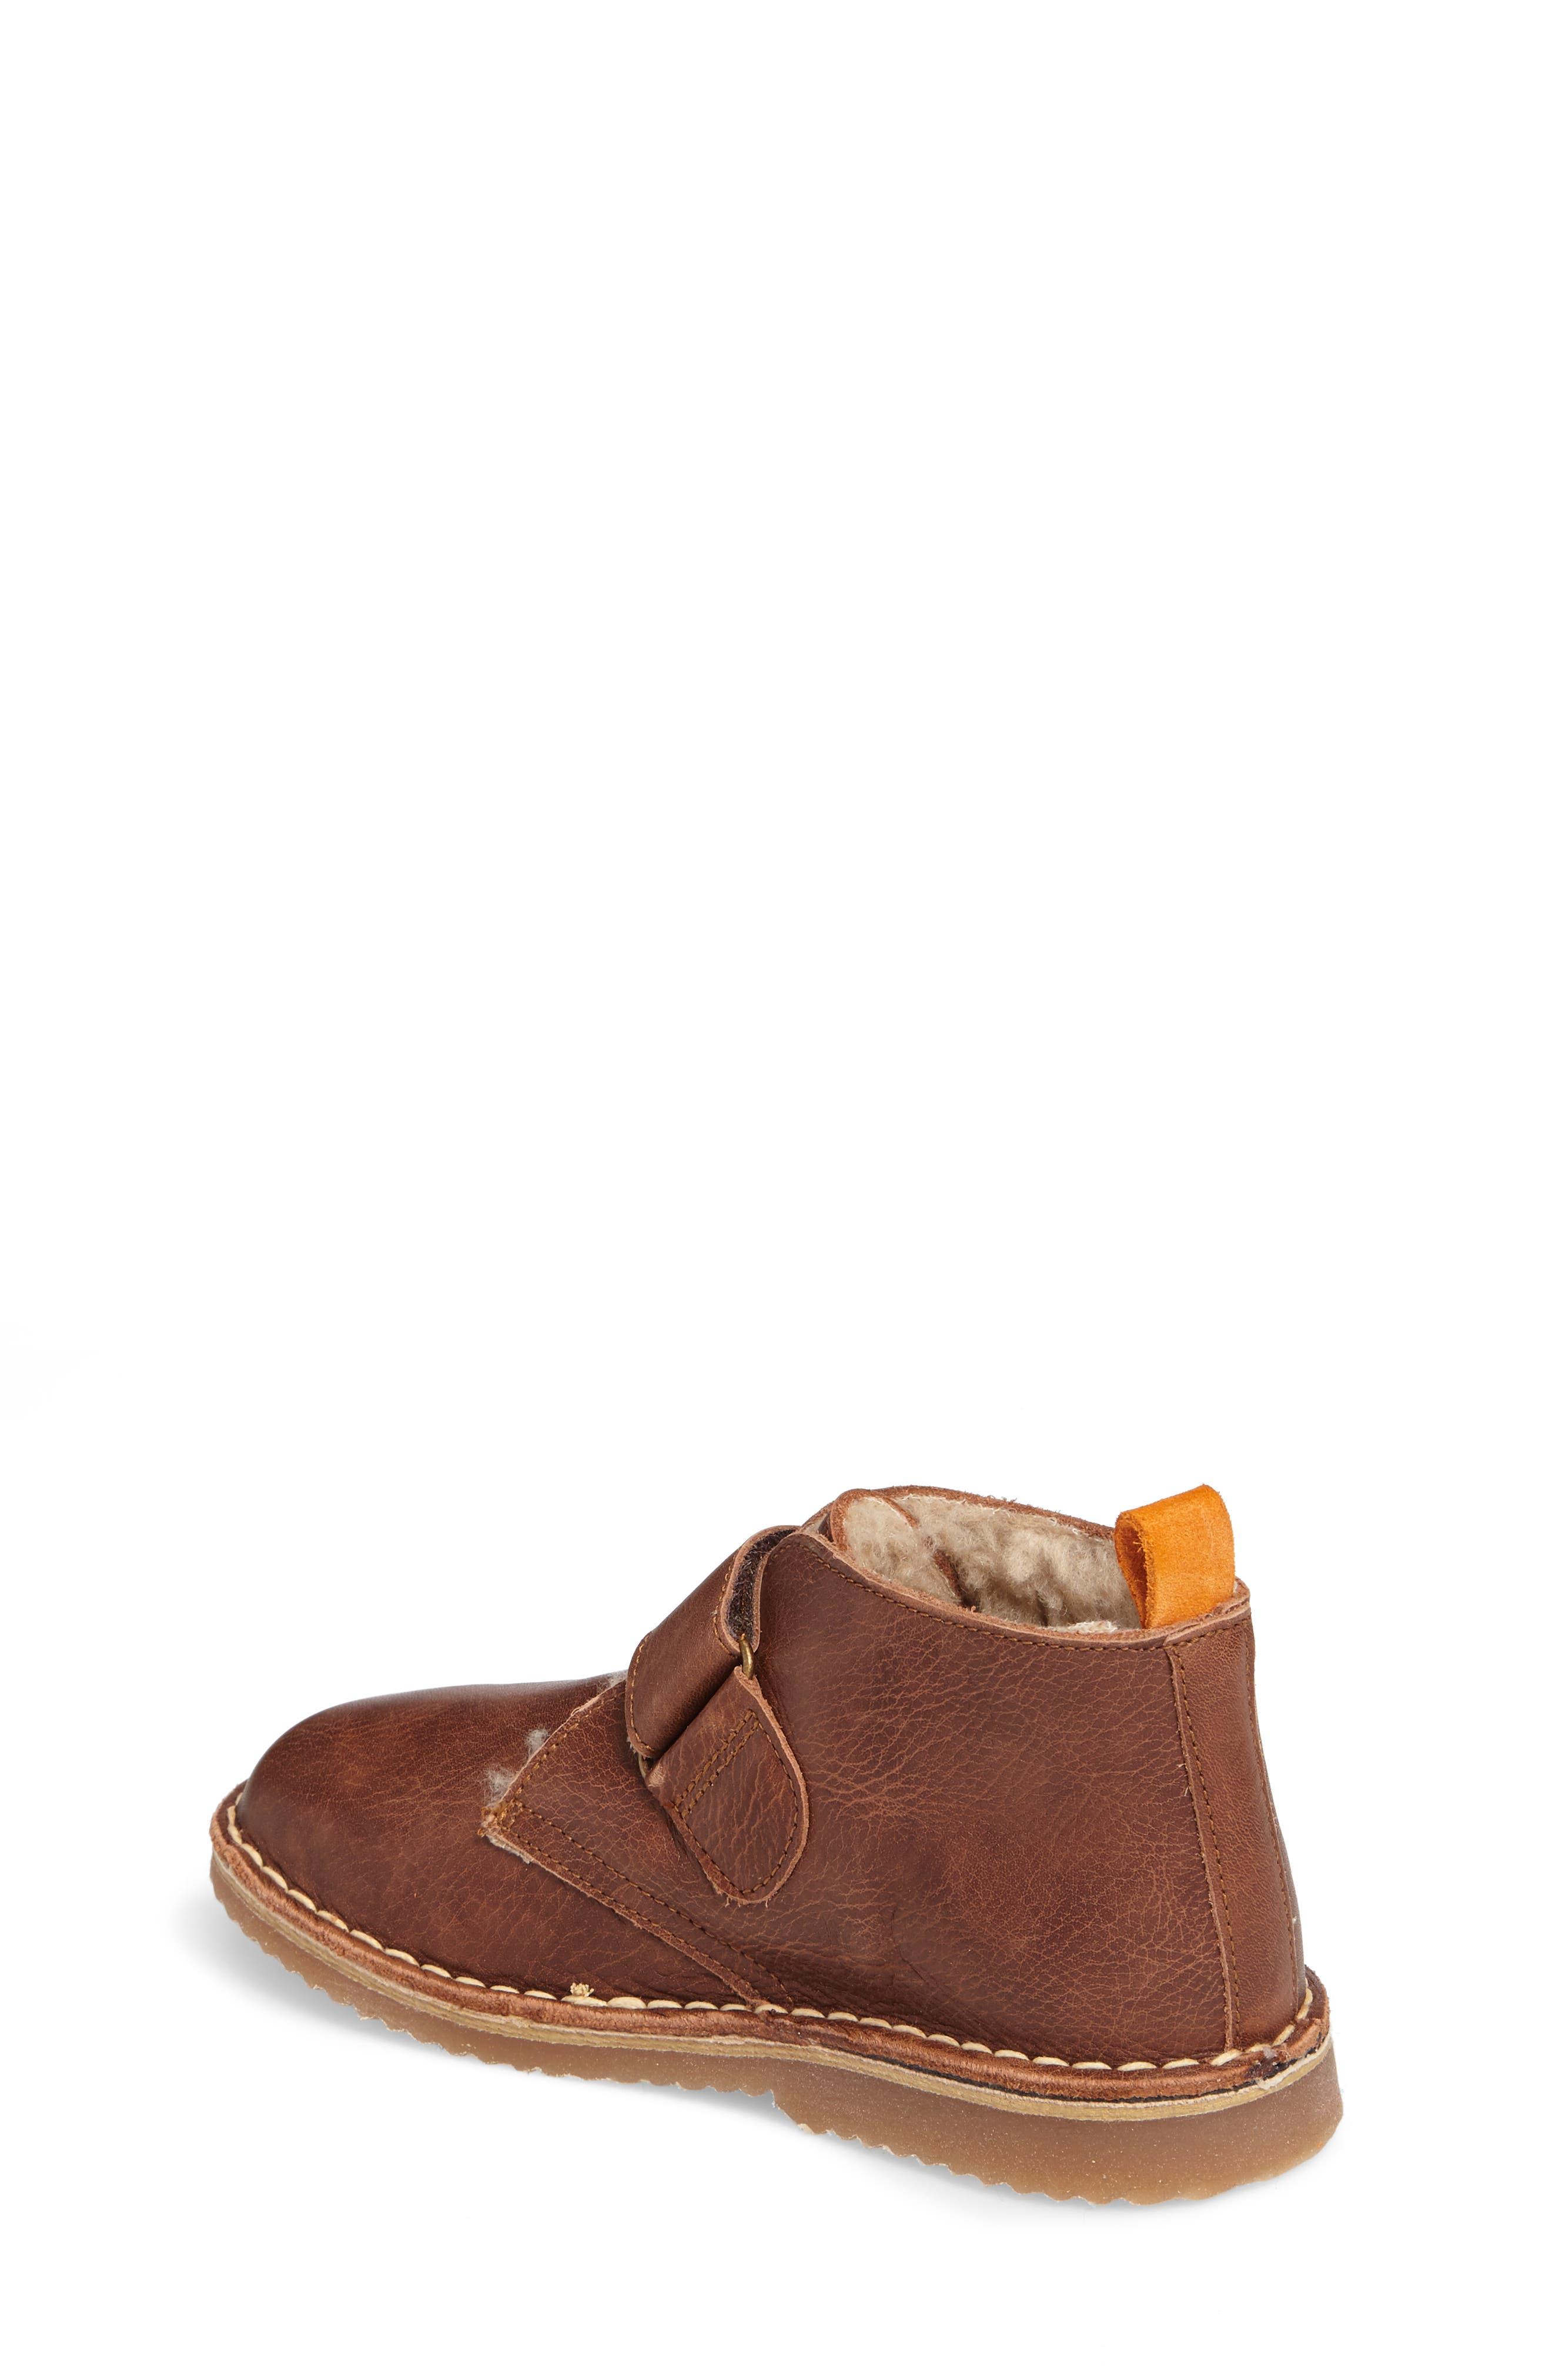 Faux Fur Desert Boot,                             Alternate thumbnail 2, color,                             Brown